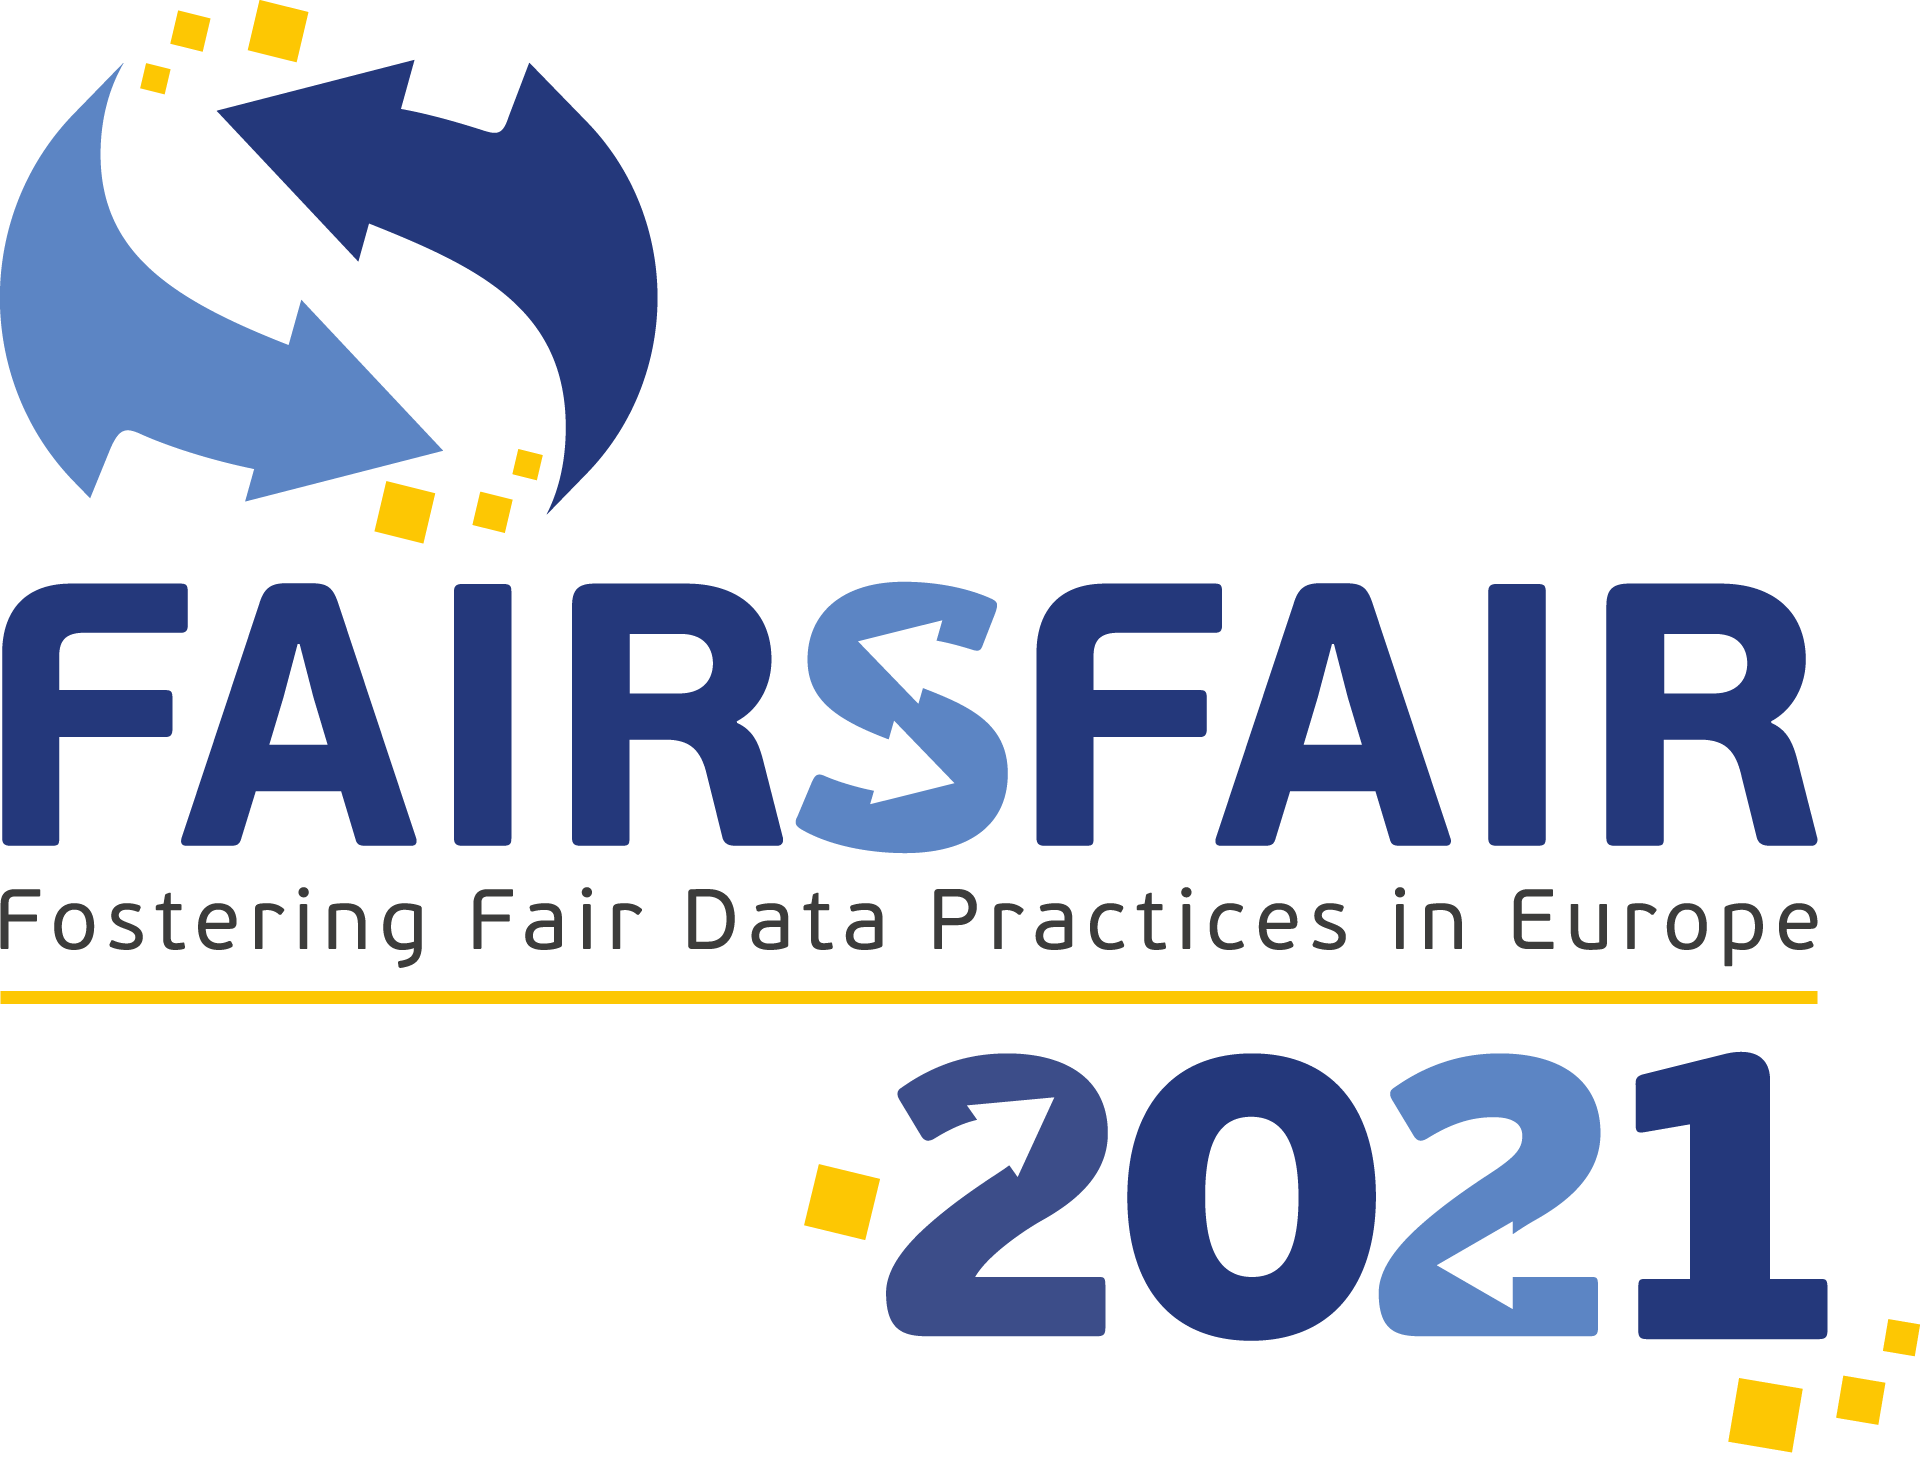 FAIRsFAIR 2021 Public Workshop